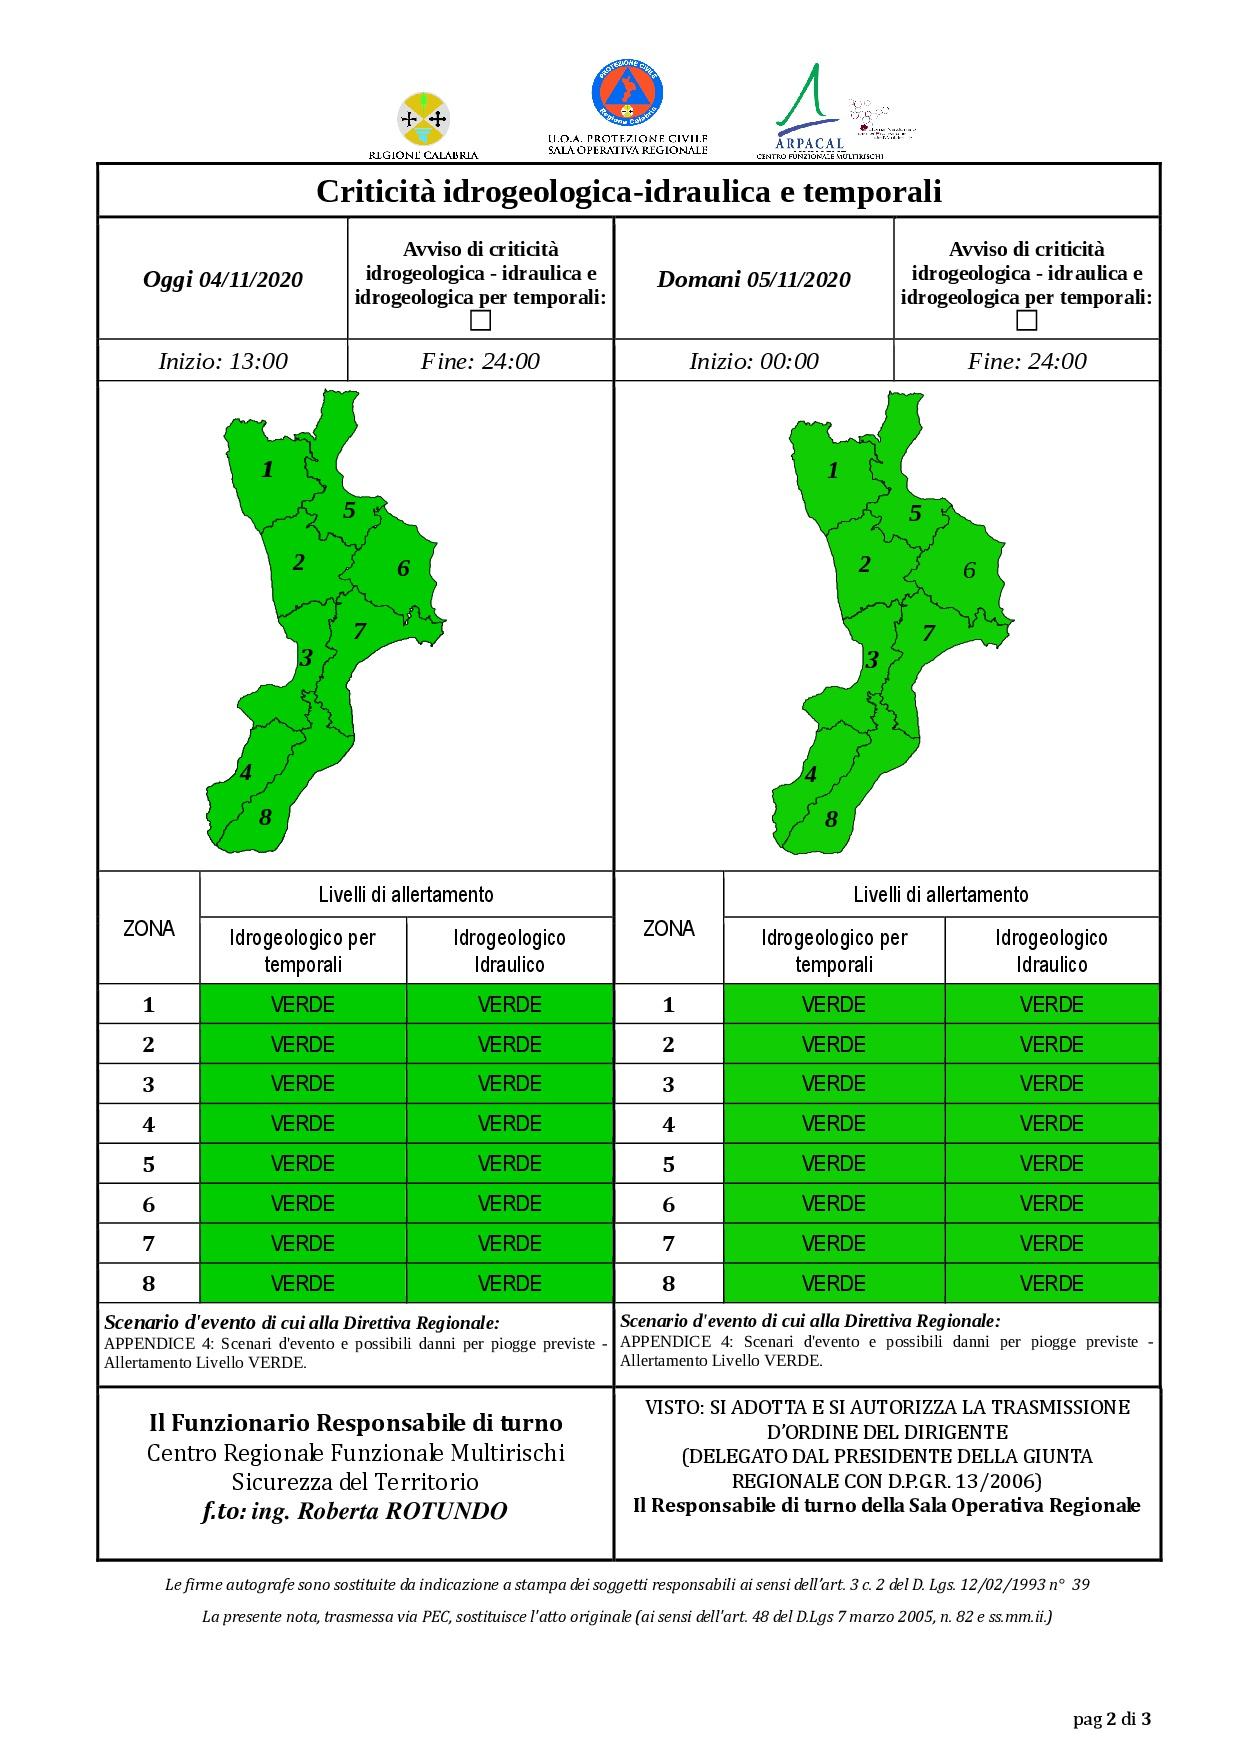 Criticità idrogeologica-idraulica e temporali in Calabria 04-11-2020